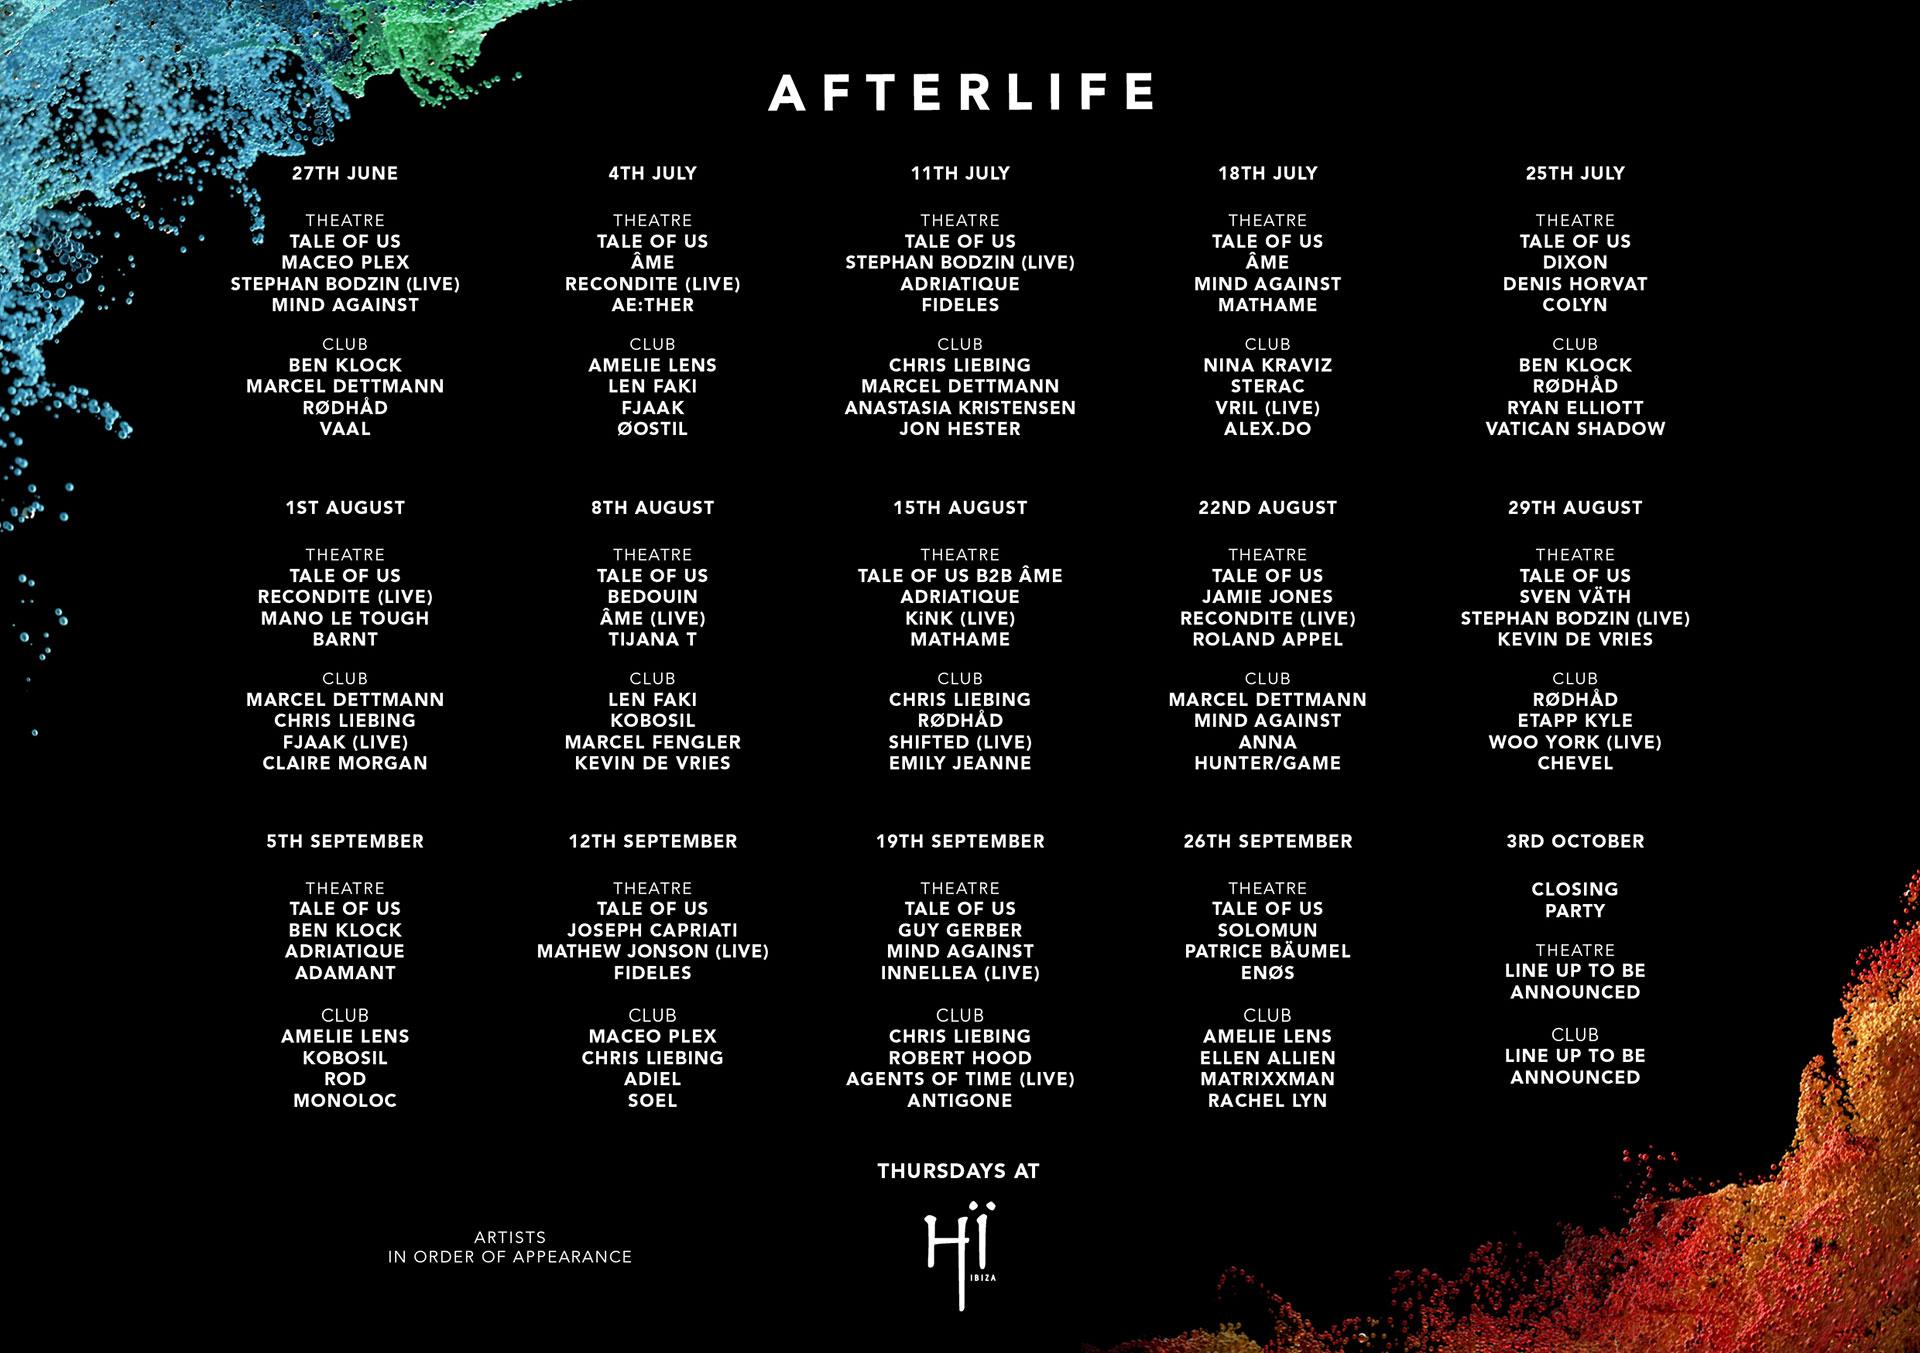 hi-ibiza-afterlife-2019-lineup-oz-edm